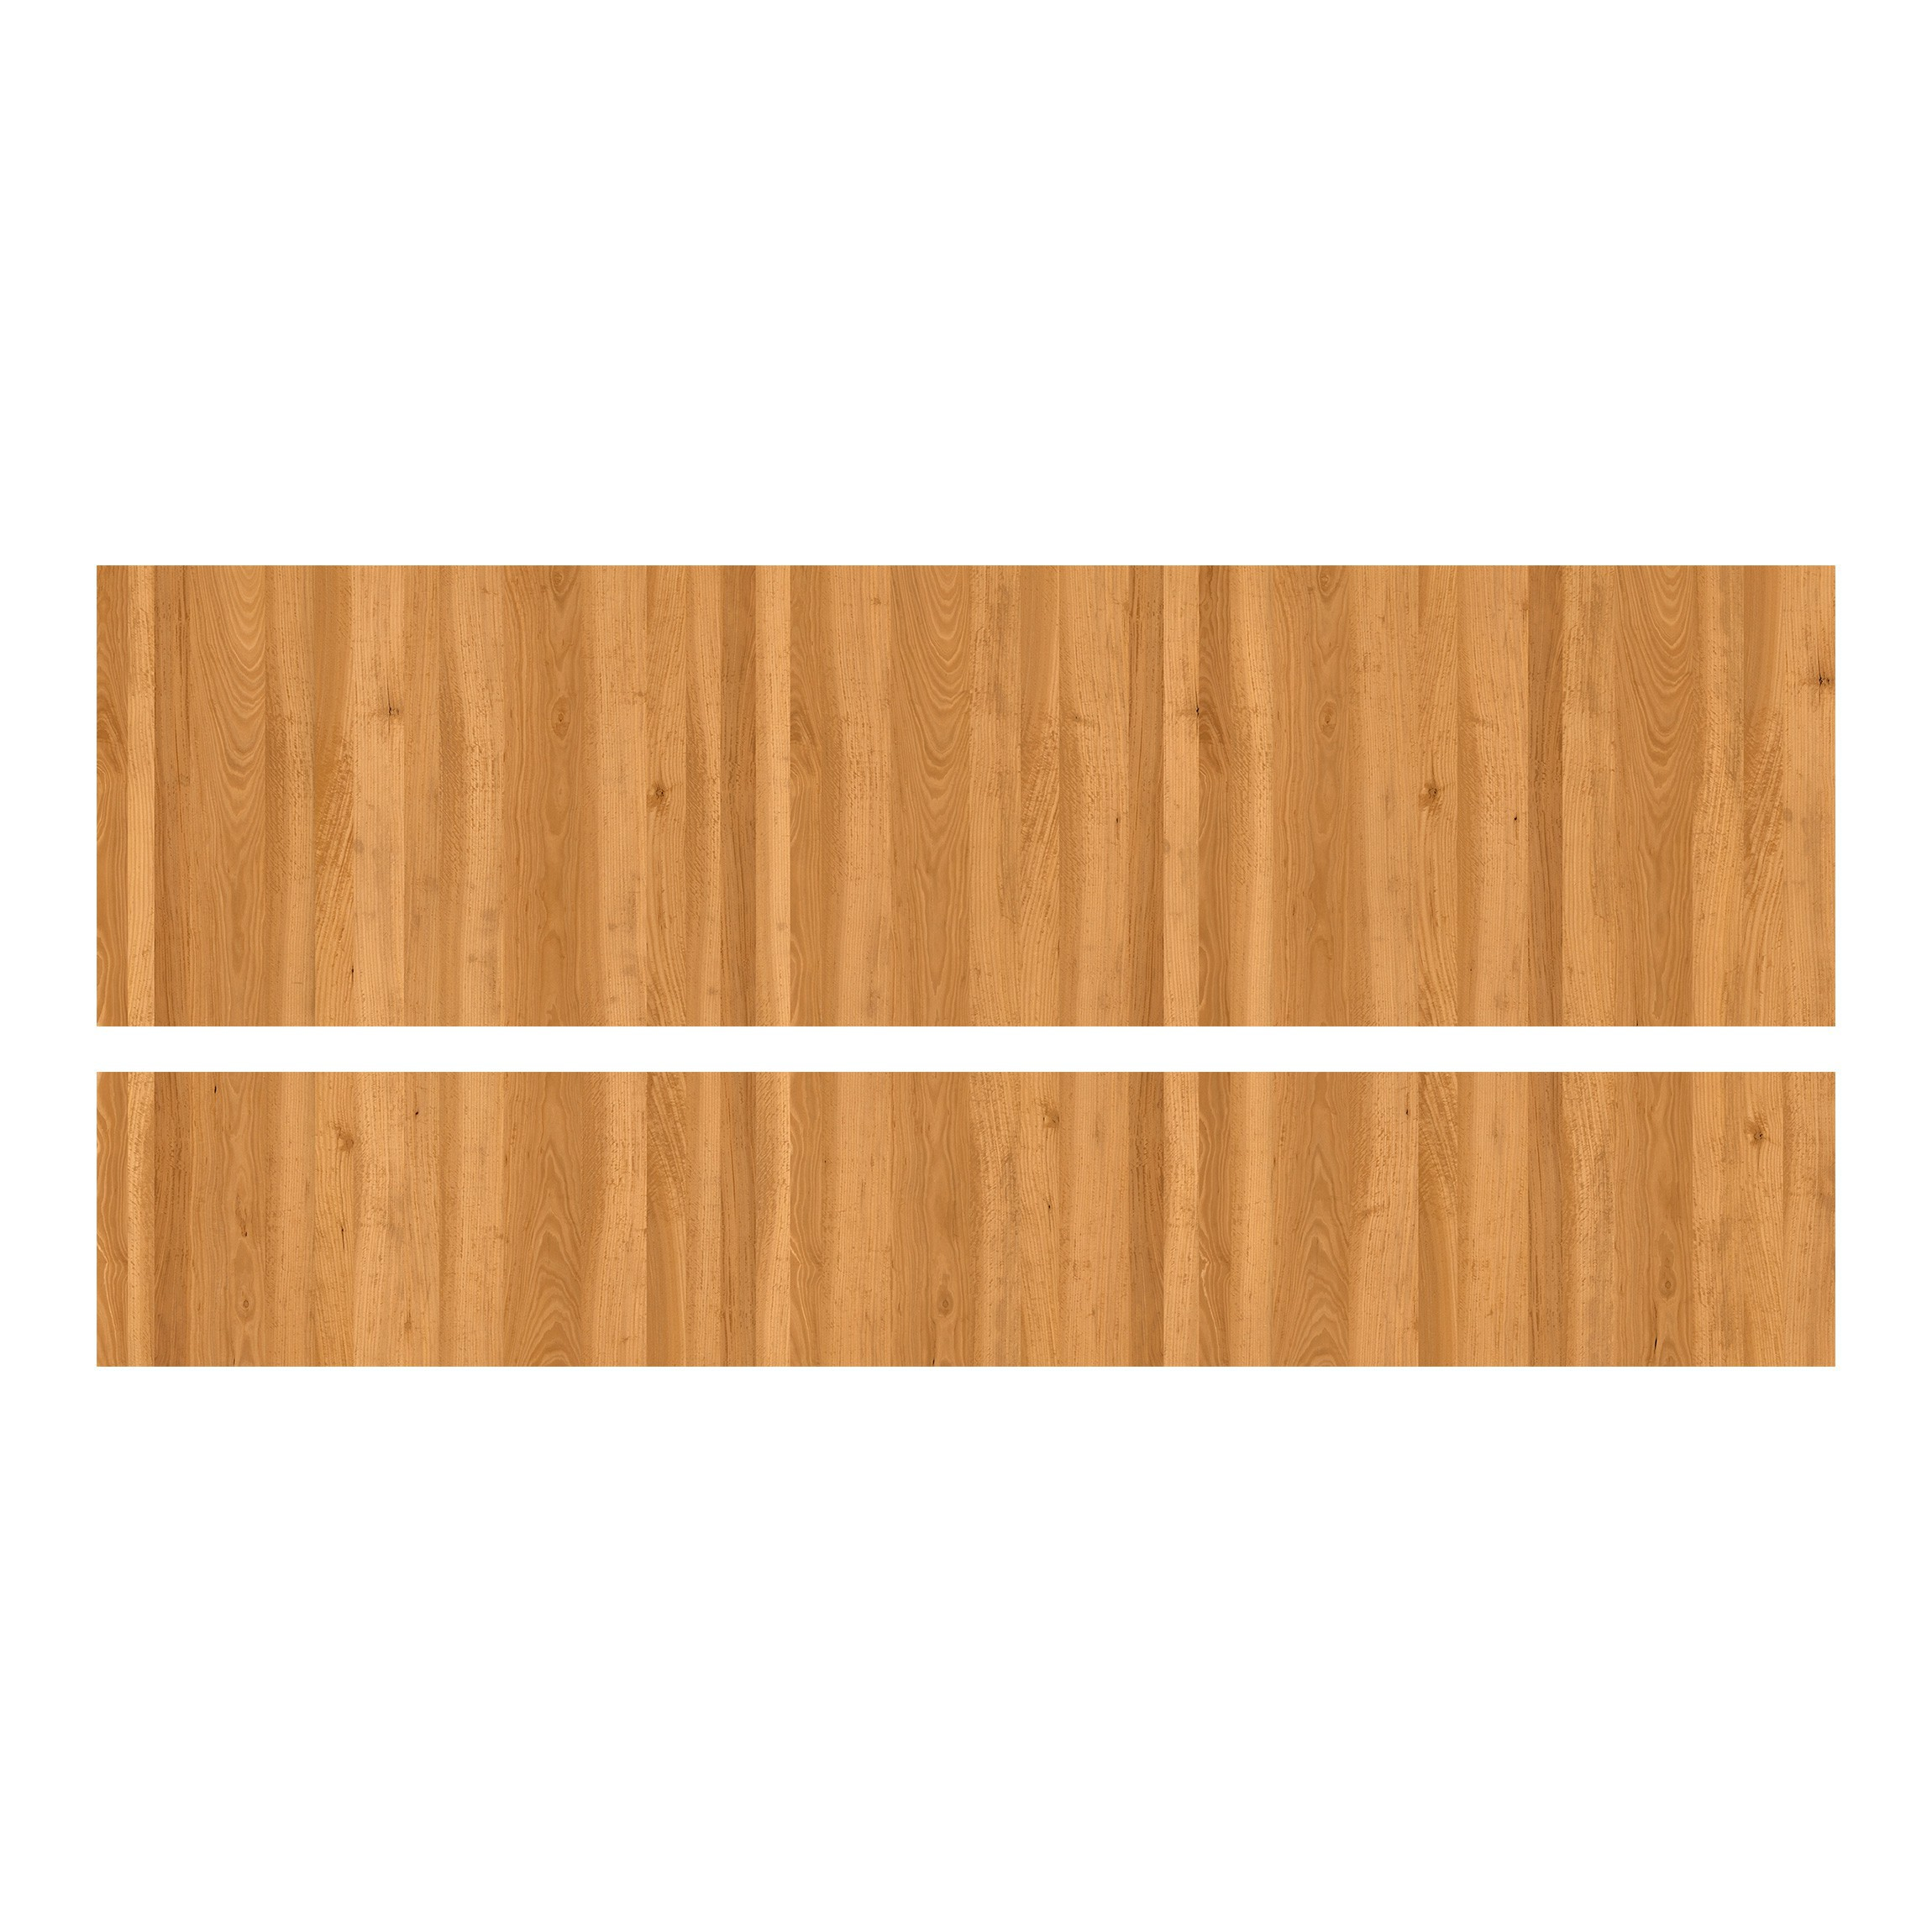 m belfolie f r ikea malm bett niedrig 160x200cm klebefolie zitrone. Black Bedroom Furniture Sets. Home Design Ideas